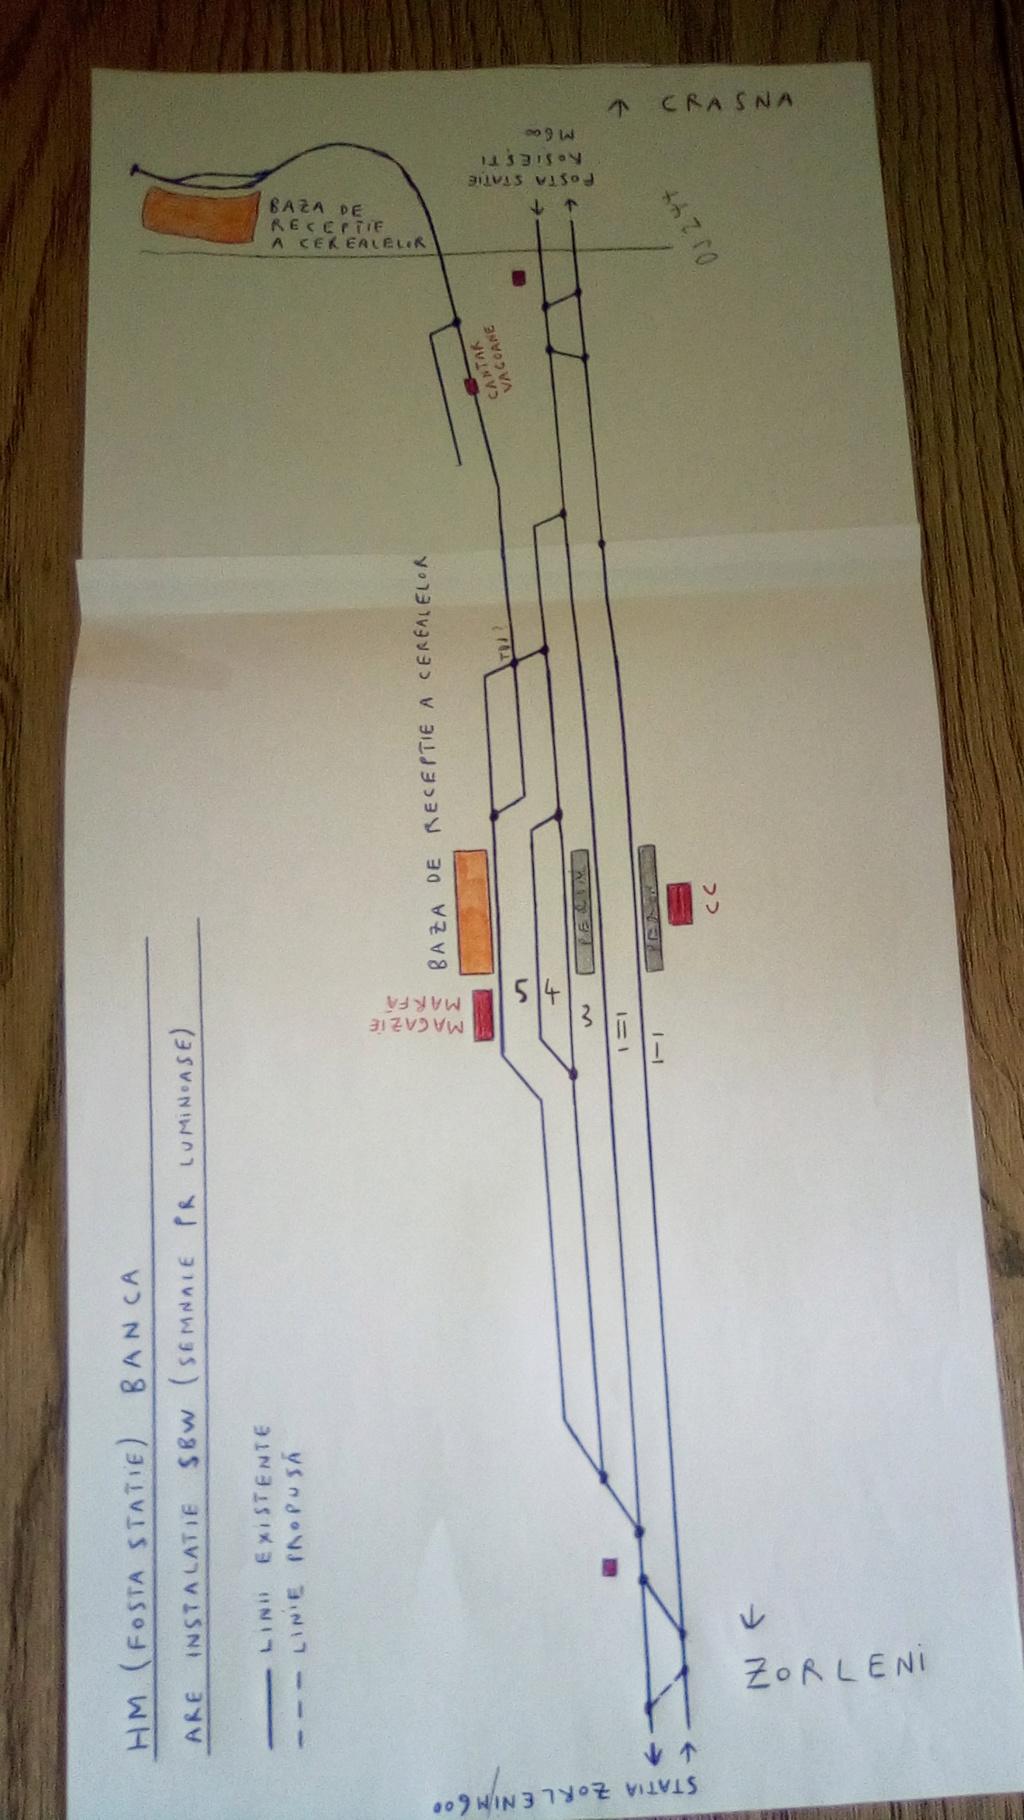 M 600 : Faurei - Tecuci - Vaslui - Iasi - Ungheni   - Pagina 21 Hm_ban10